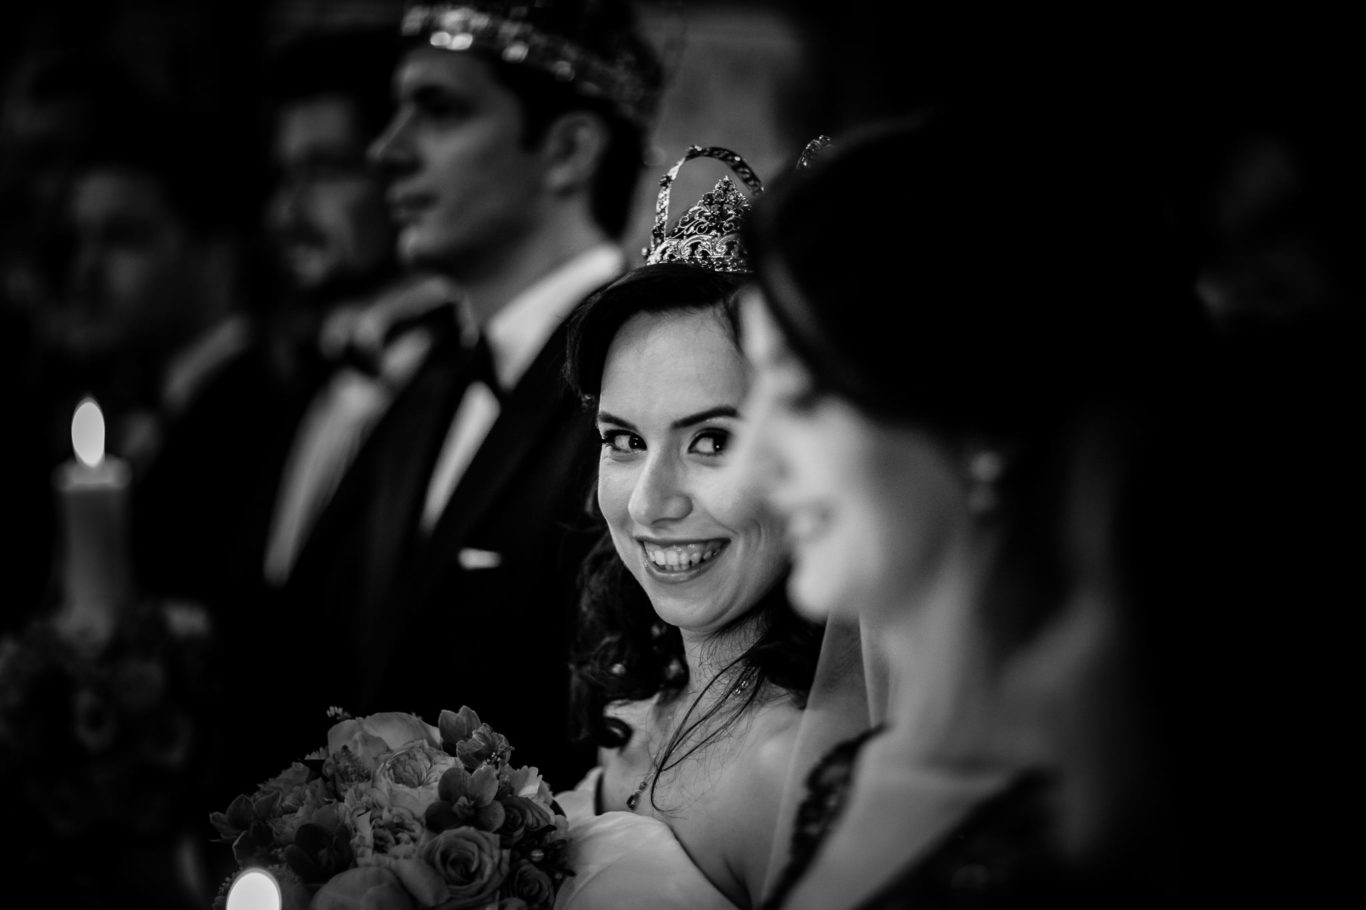 0464-Fotografie-nunta-Simona-Valentin-fotograf-Ciprian-Dumitrescu-CDF_9360